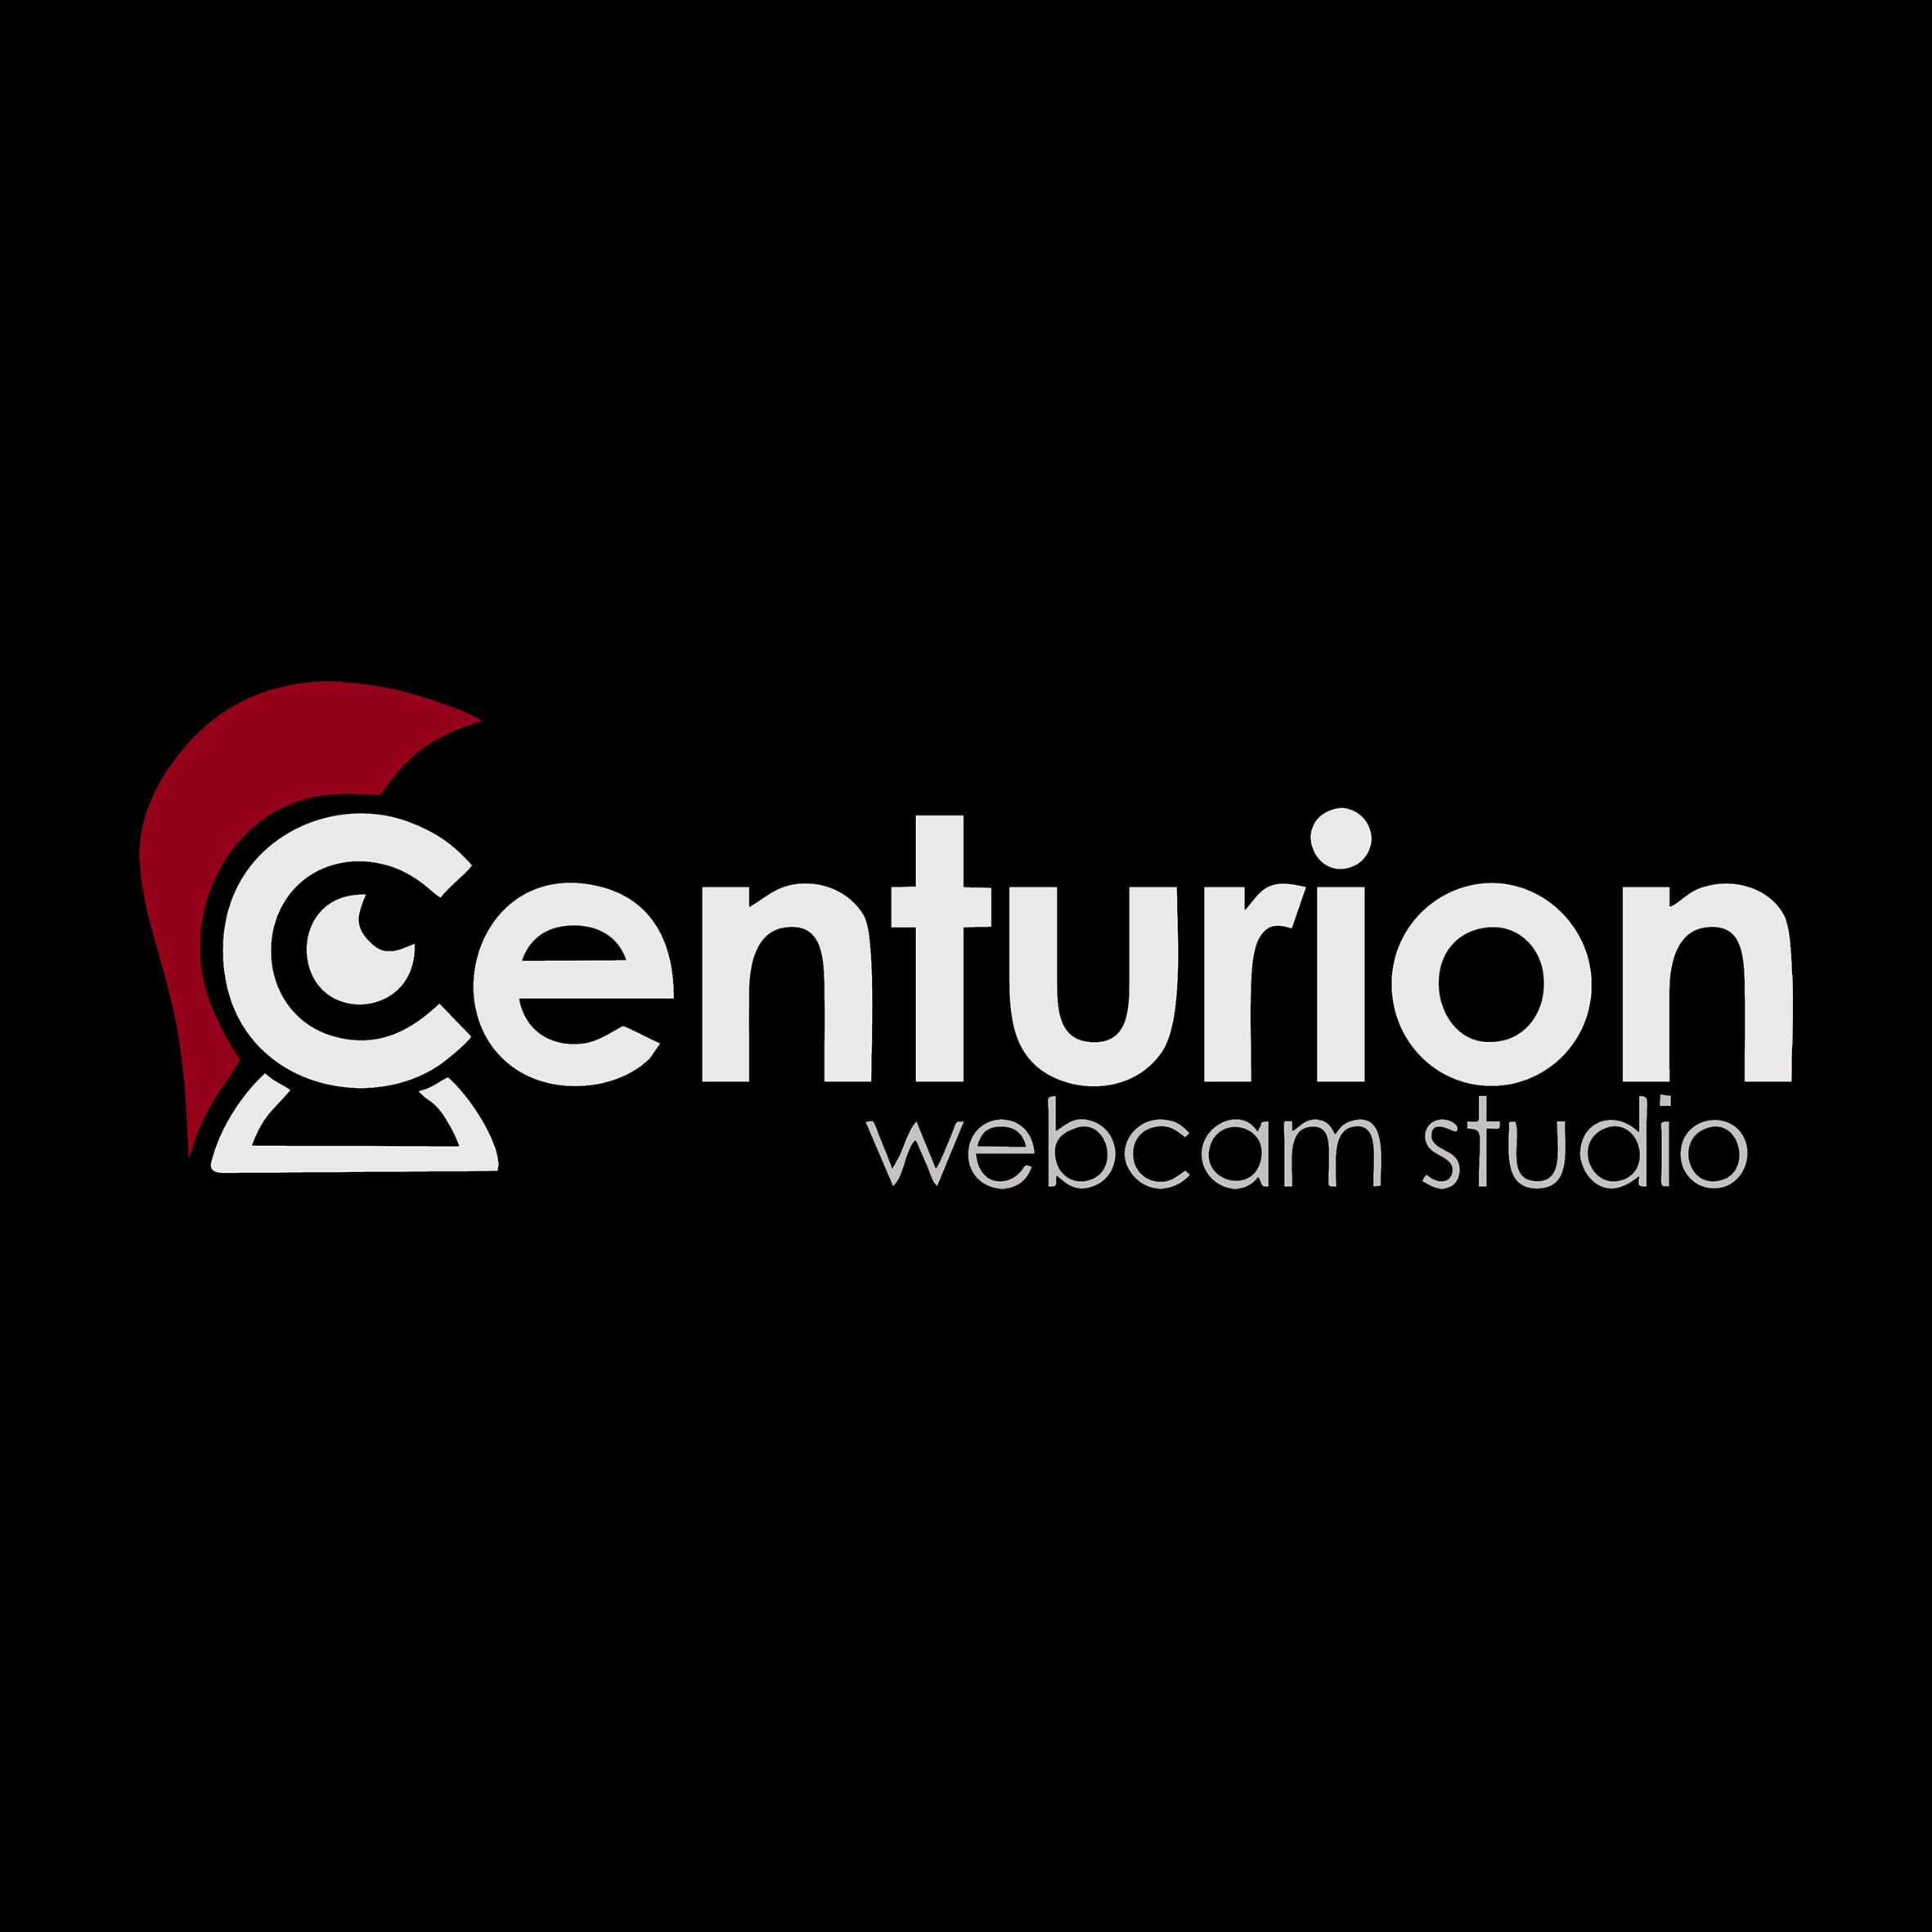 Отзыв вебкам студия CENTURION